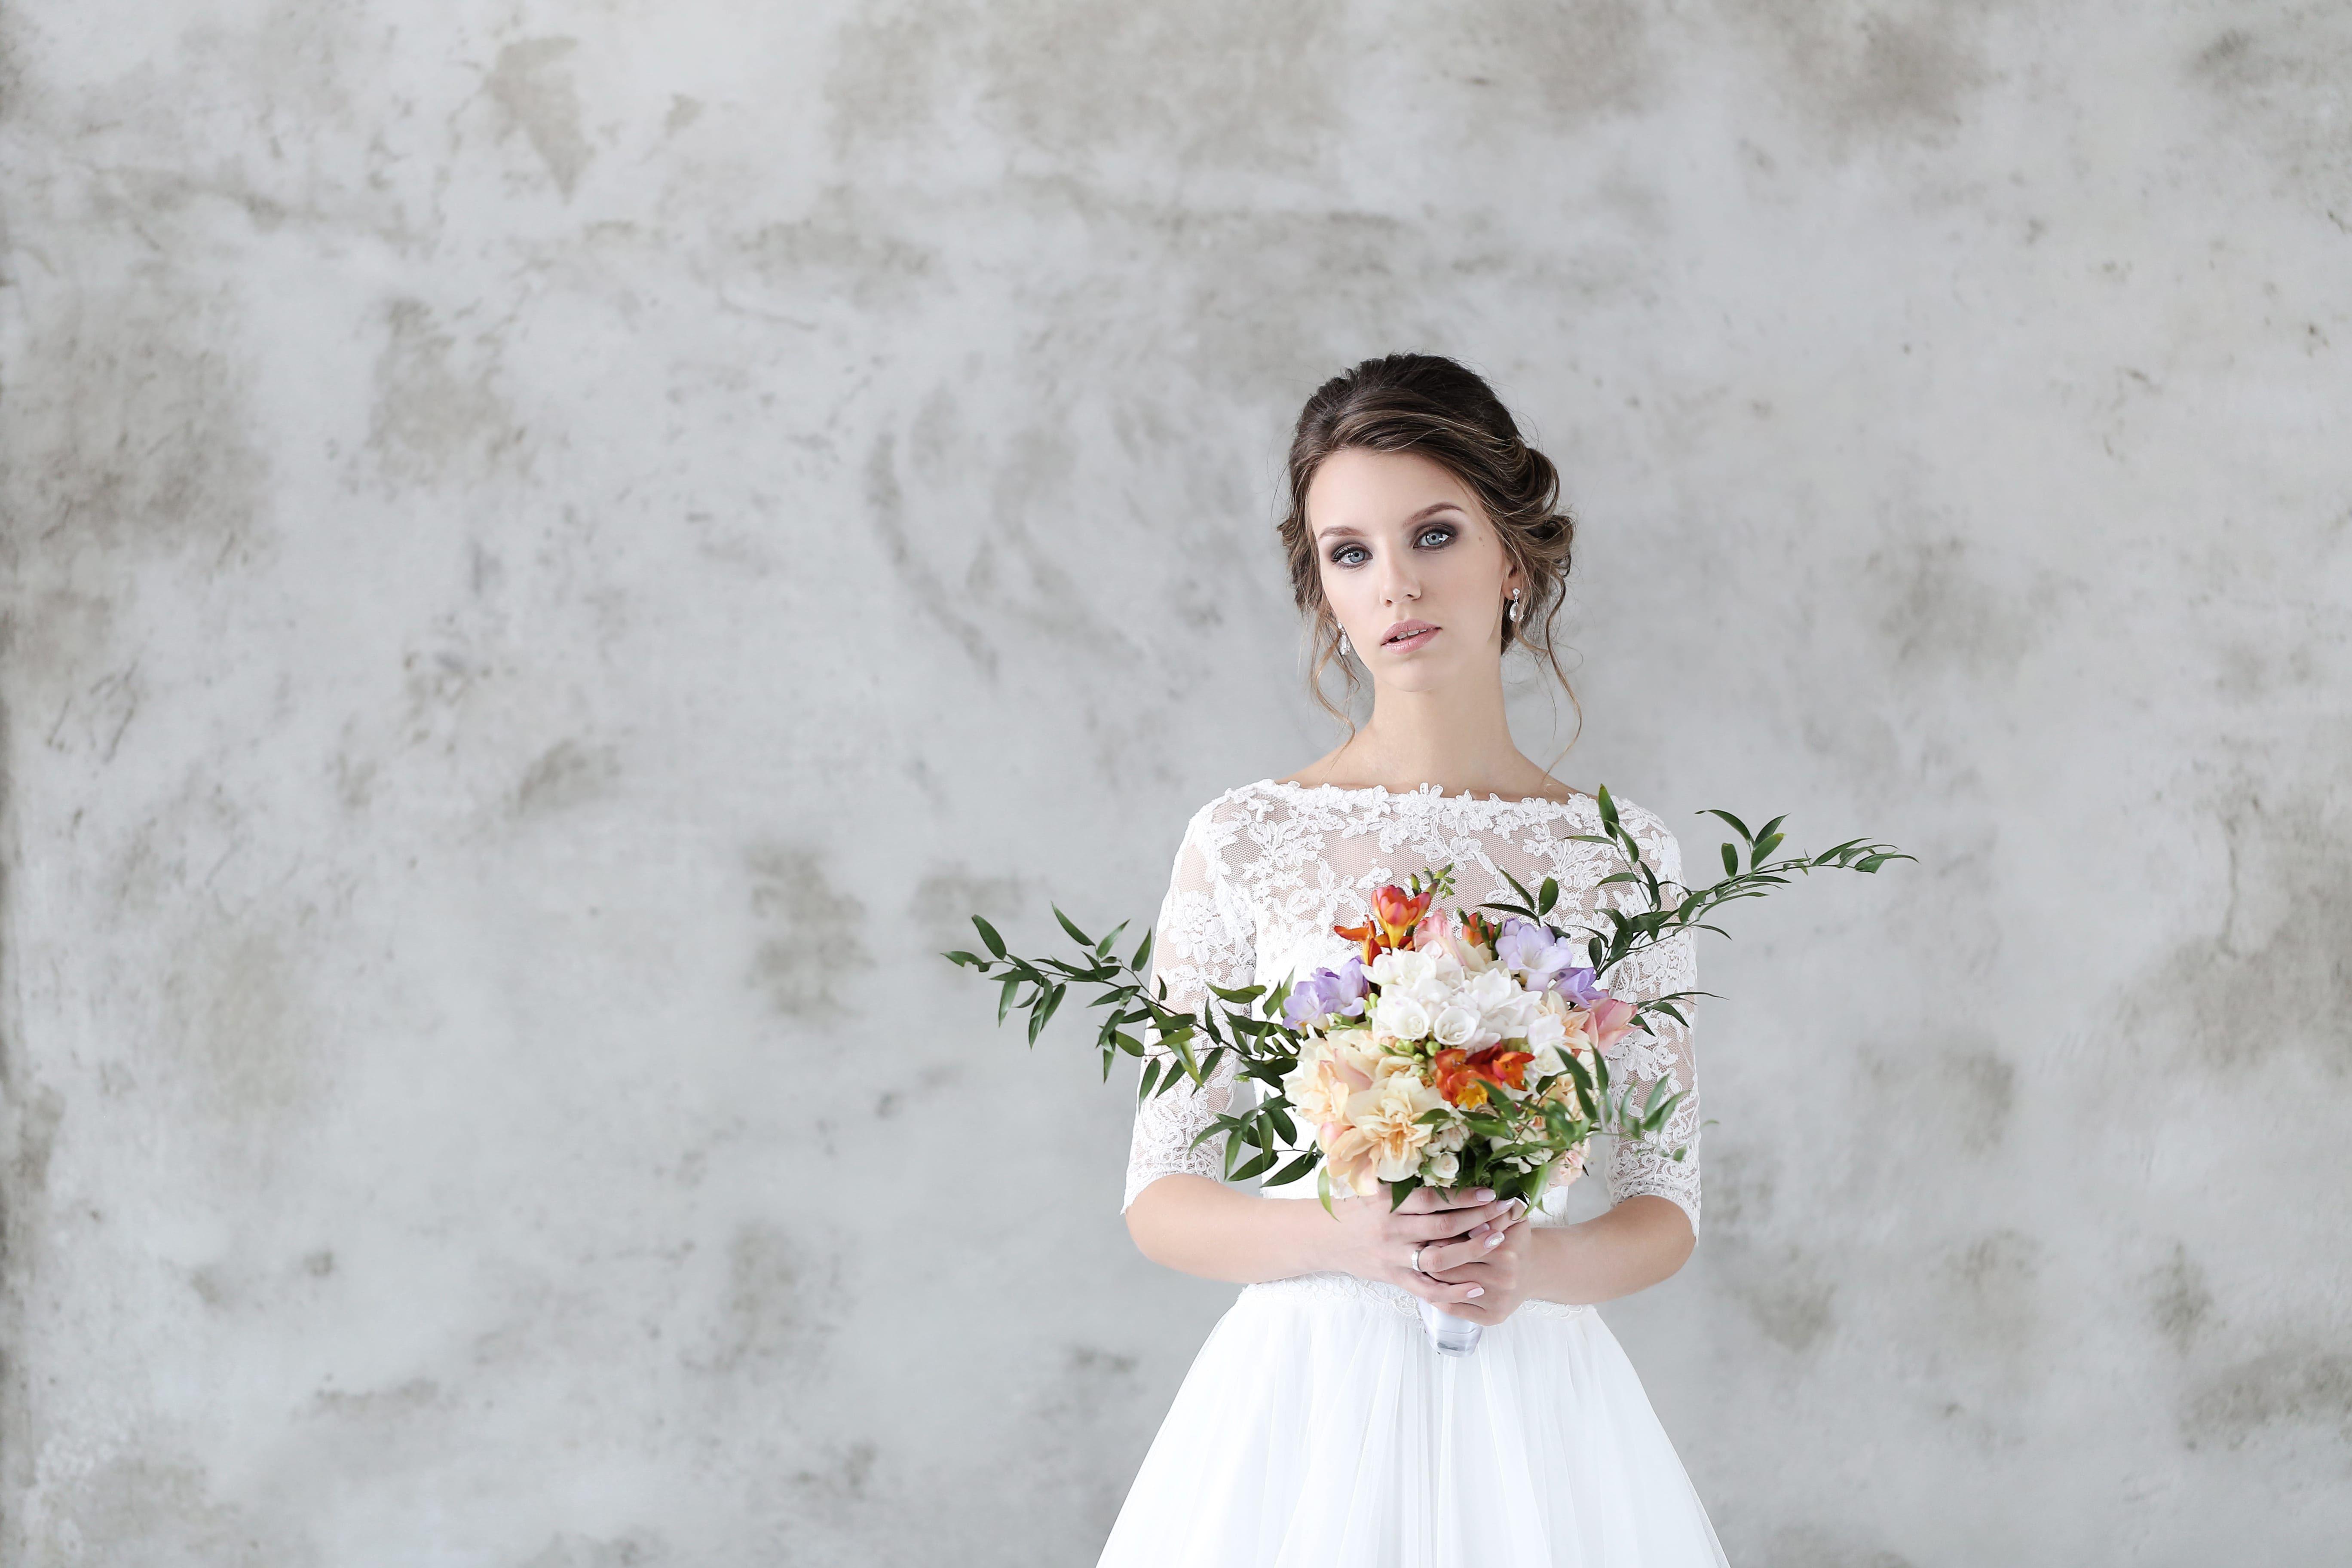 Wedding Dress Styles & Silhouette - Rustic Wedding Chic